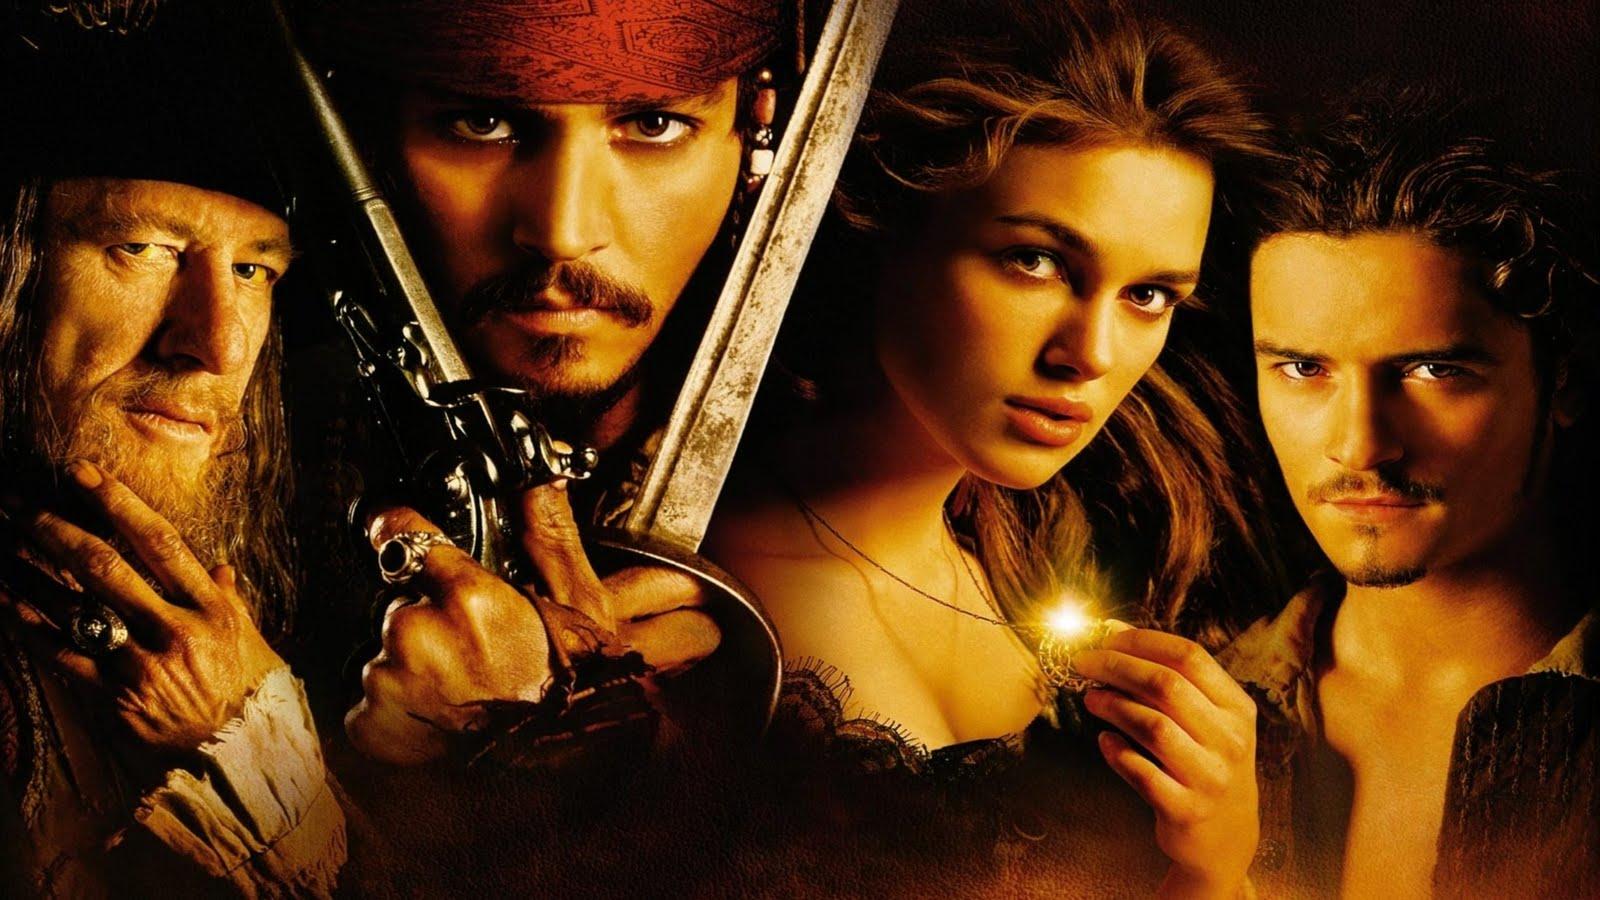 http://4.bp.blogspot.com/_wg3BmAj-bsI/SwH90q_OW0I/AAAAAAAAMac/f-BindXP14k/s1600/Pirates_Of_The_Caribbean_-_The_Curse_Of_The_Black_Pearl_-_Fanart_02__2003_.jpg